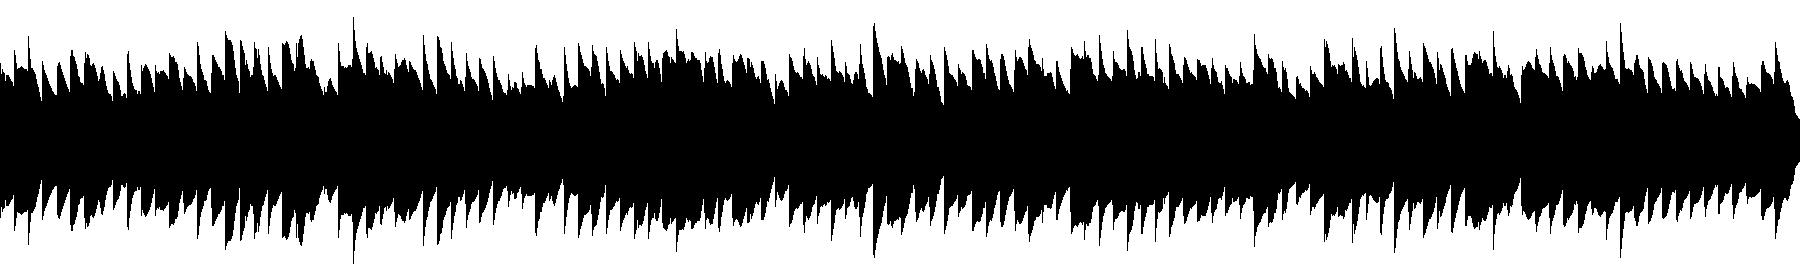 dp sequence apreg loop03